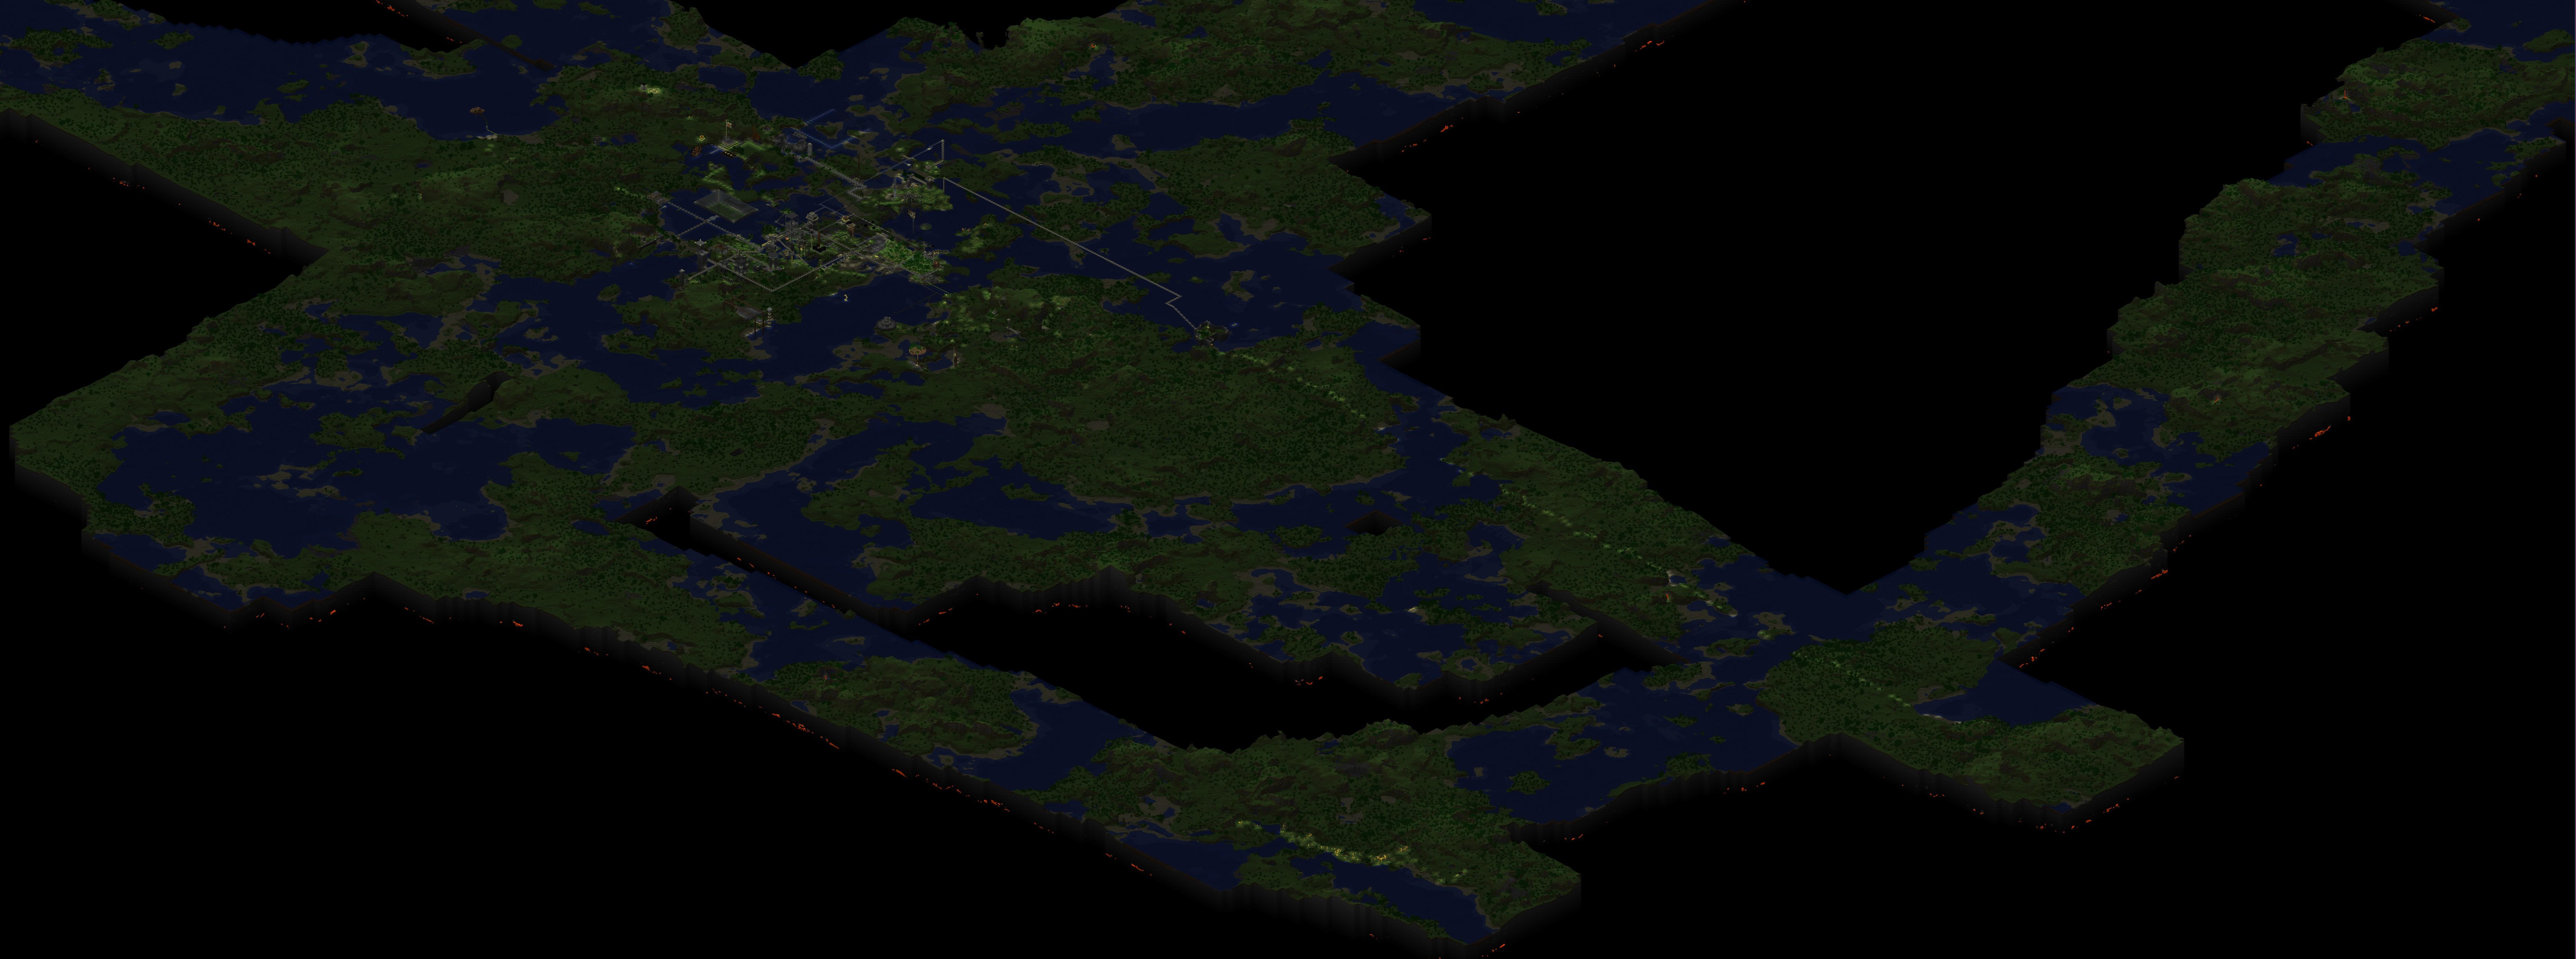 ragns games mods factionsalliances kind pointless edit turn hope server disable minecraft flying